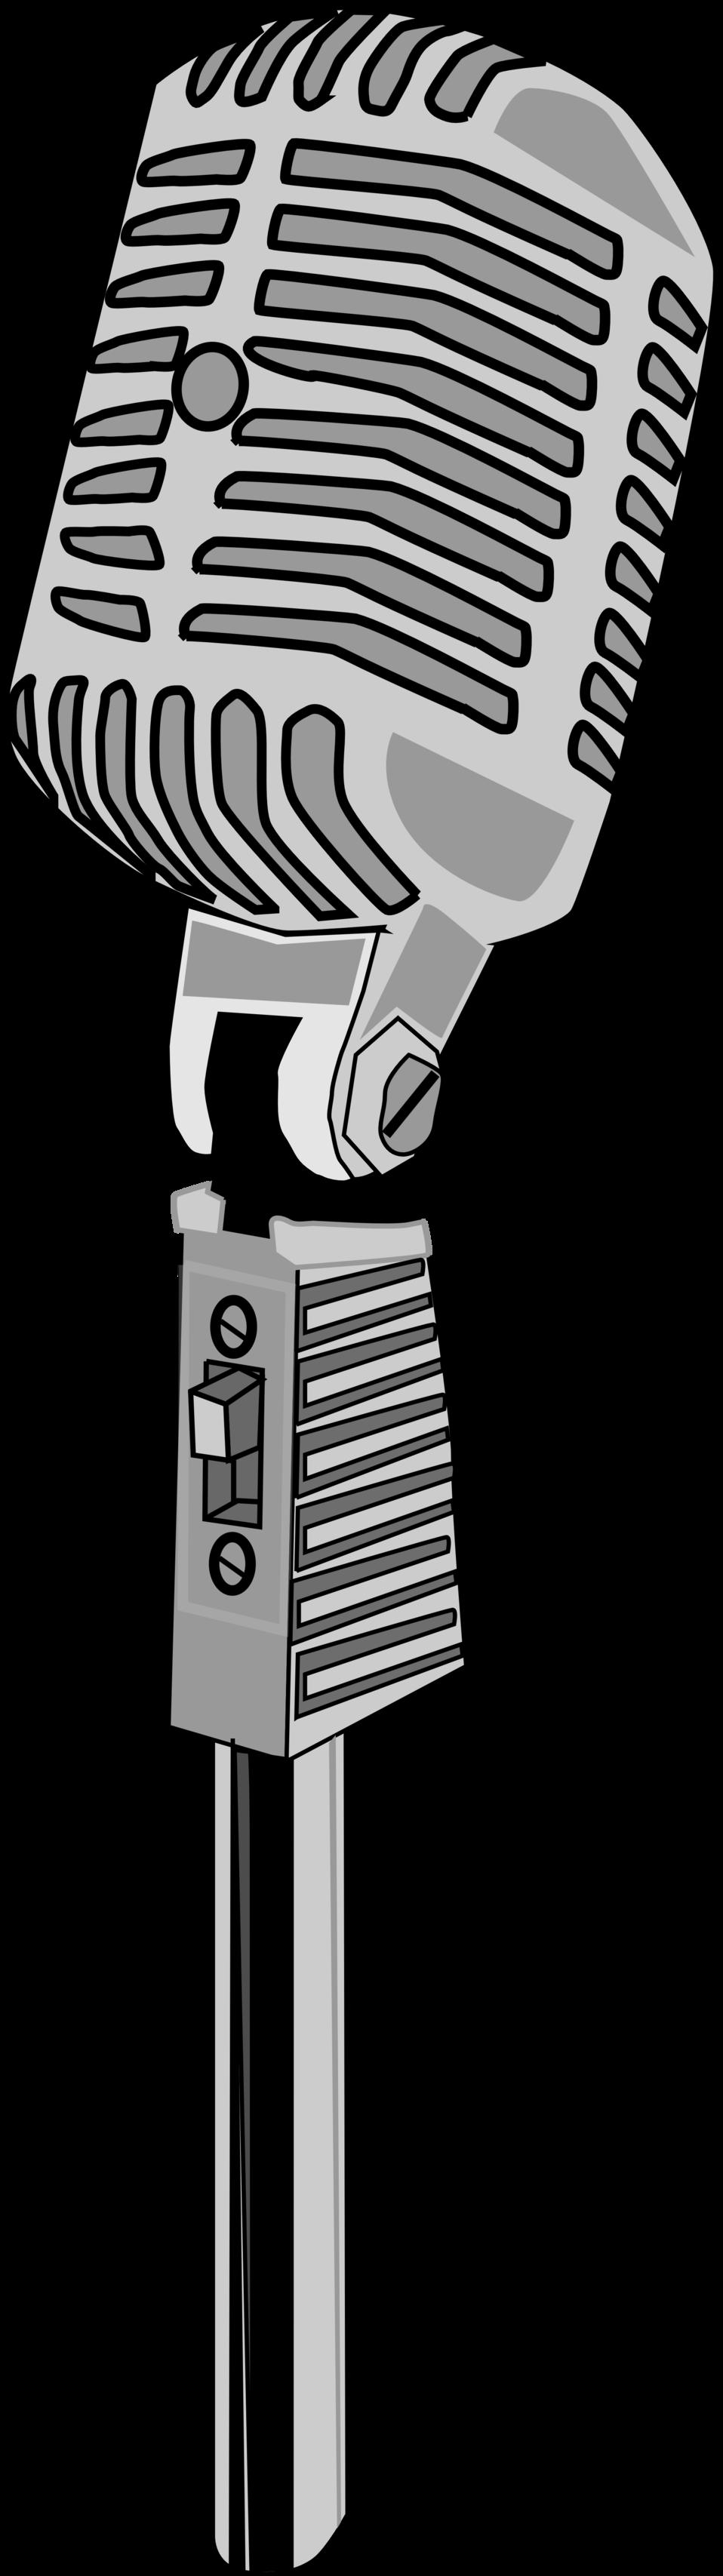 Clipart music microphone. Public domain clip art